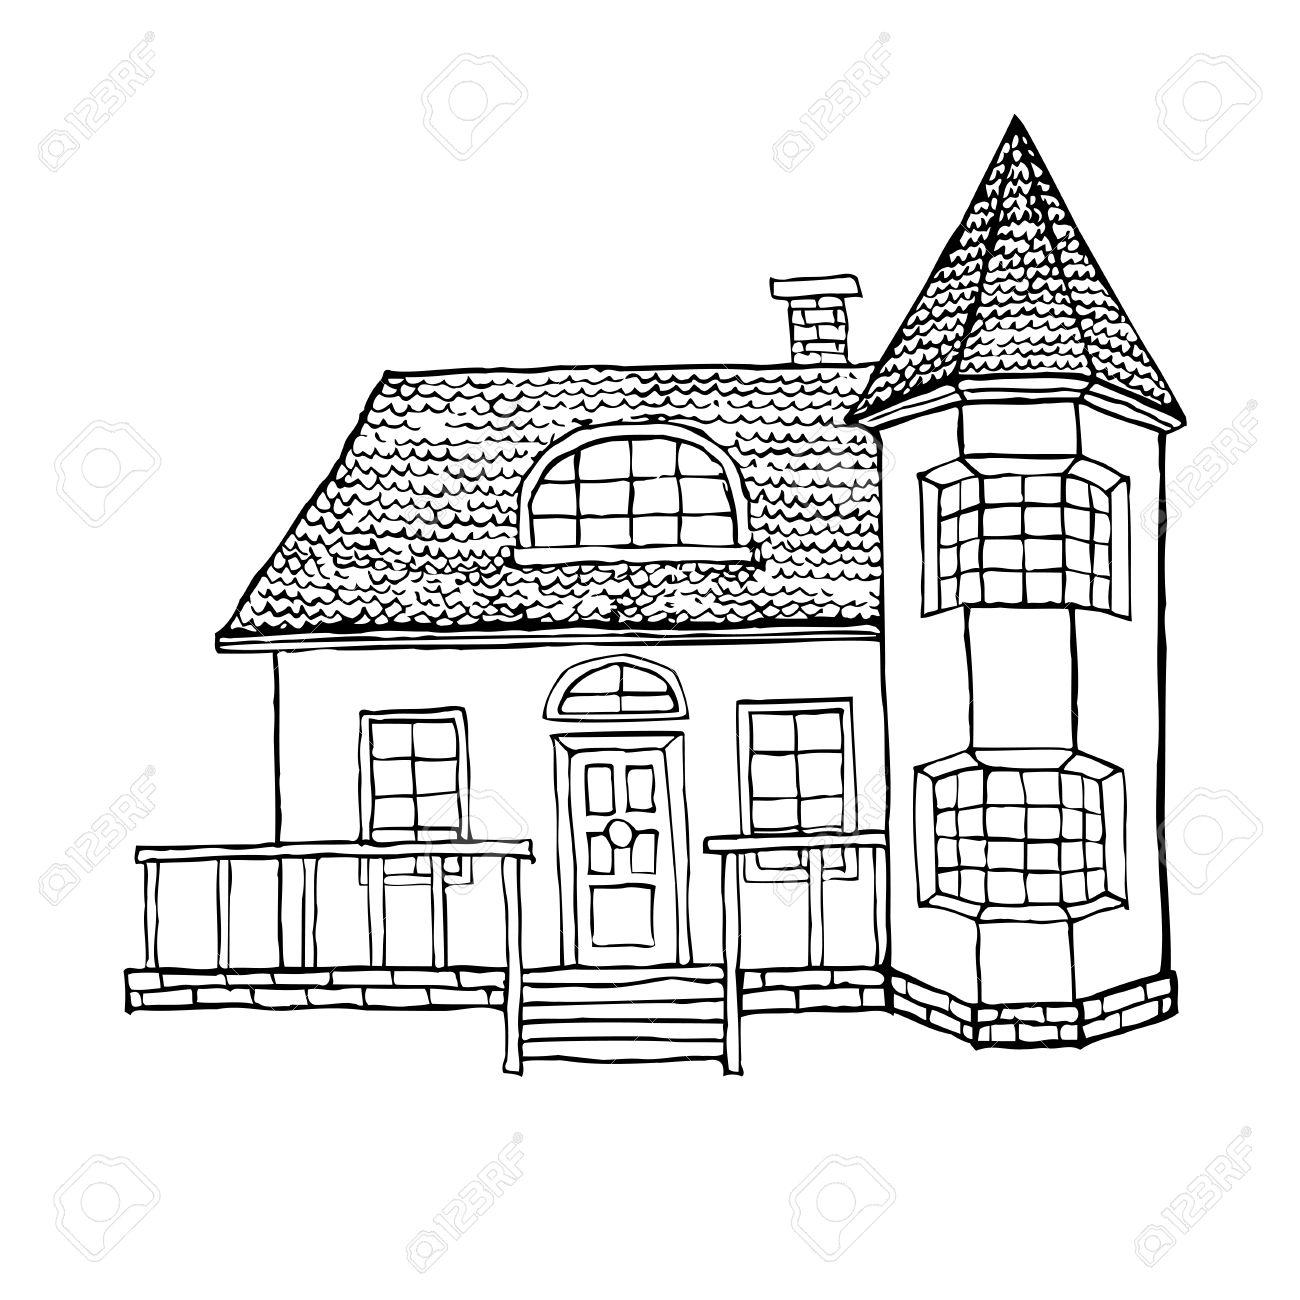 Bay Window Drawing At Getdrawings